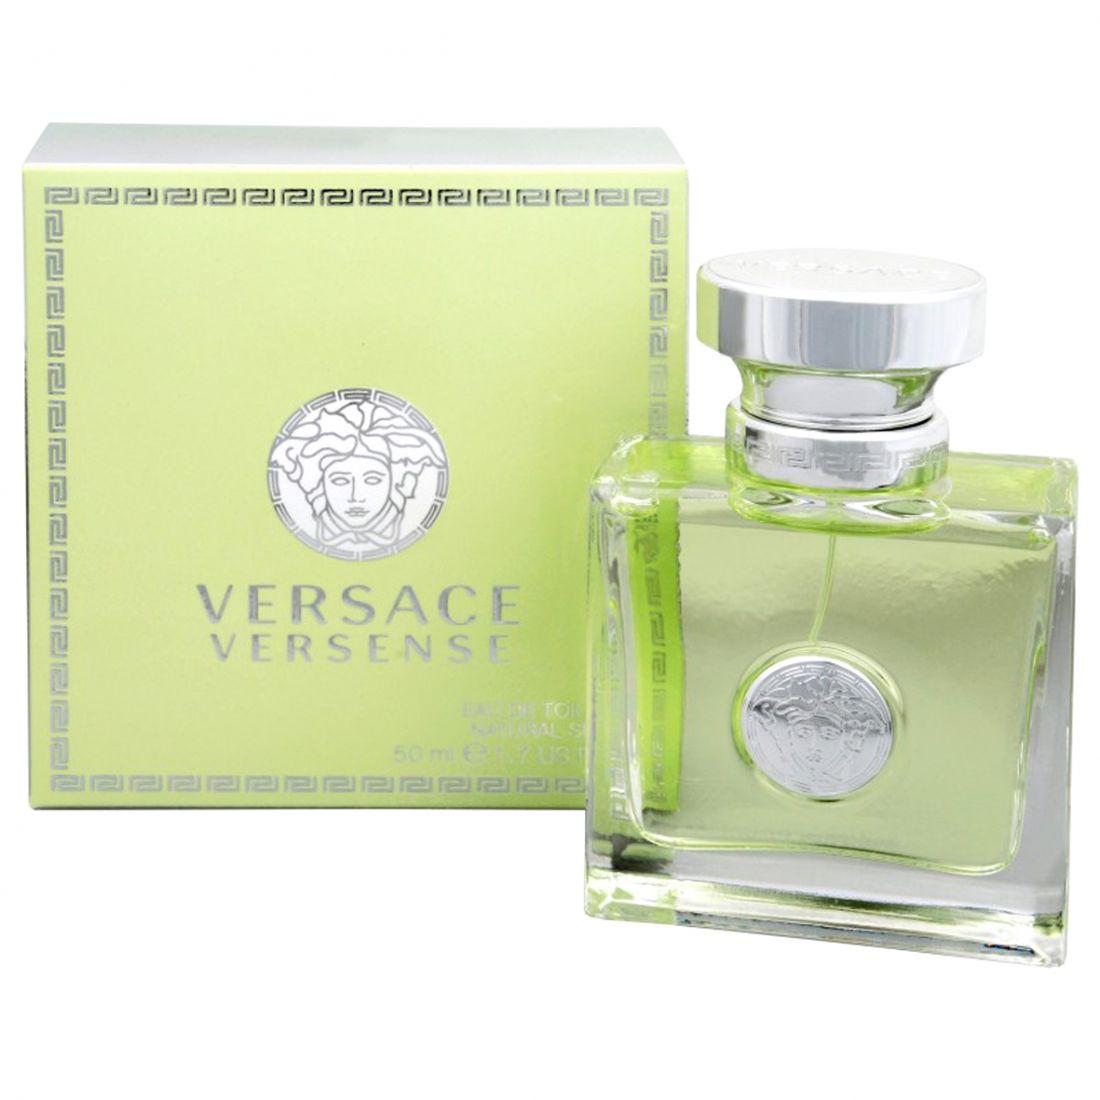 Versace - Versense, 50 ml